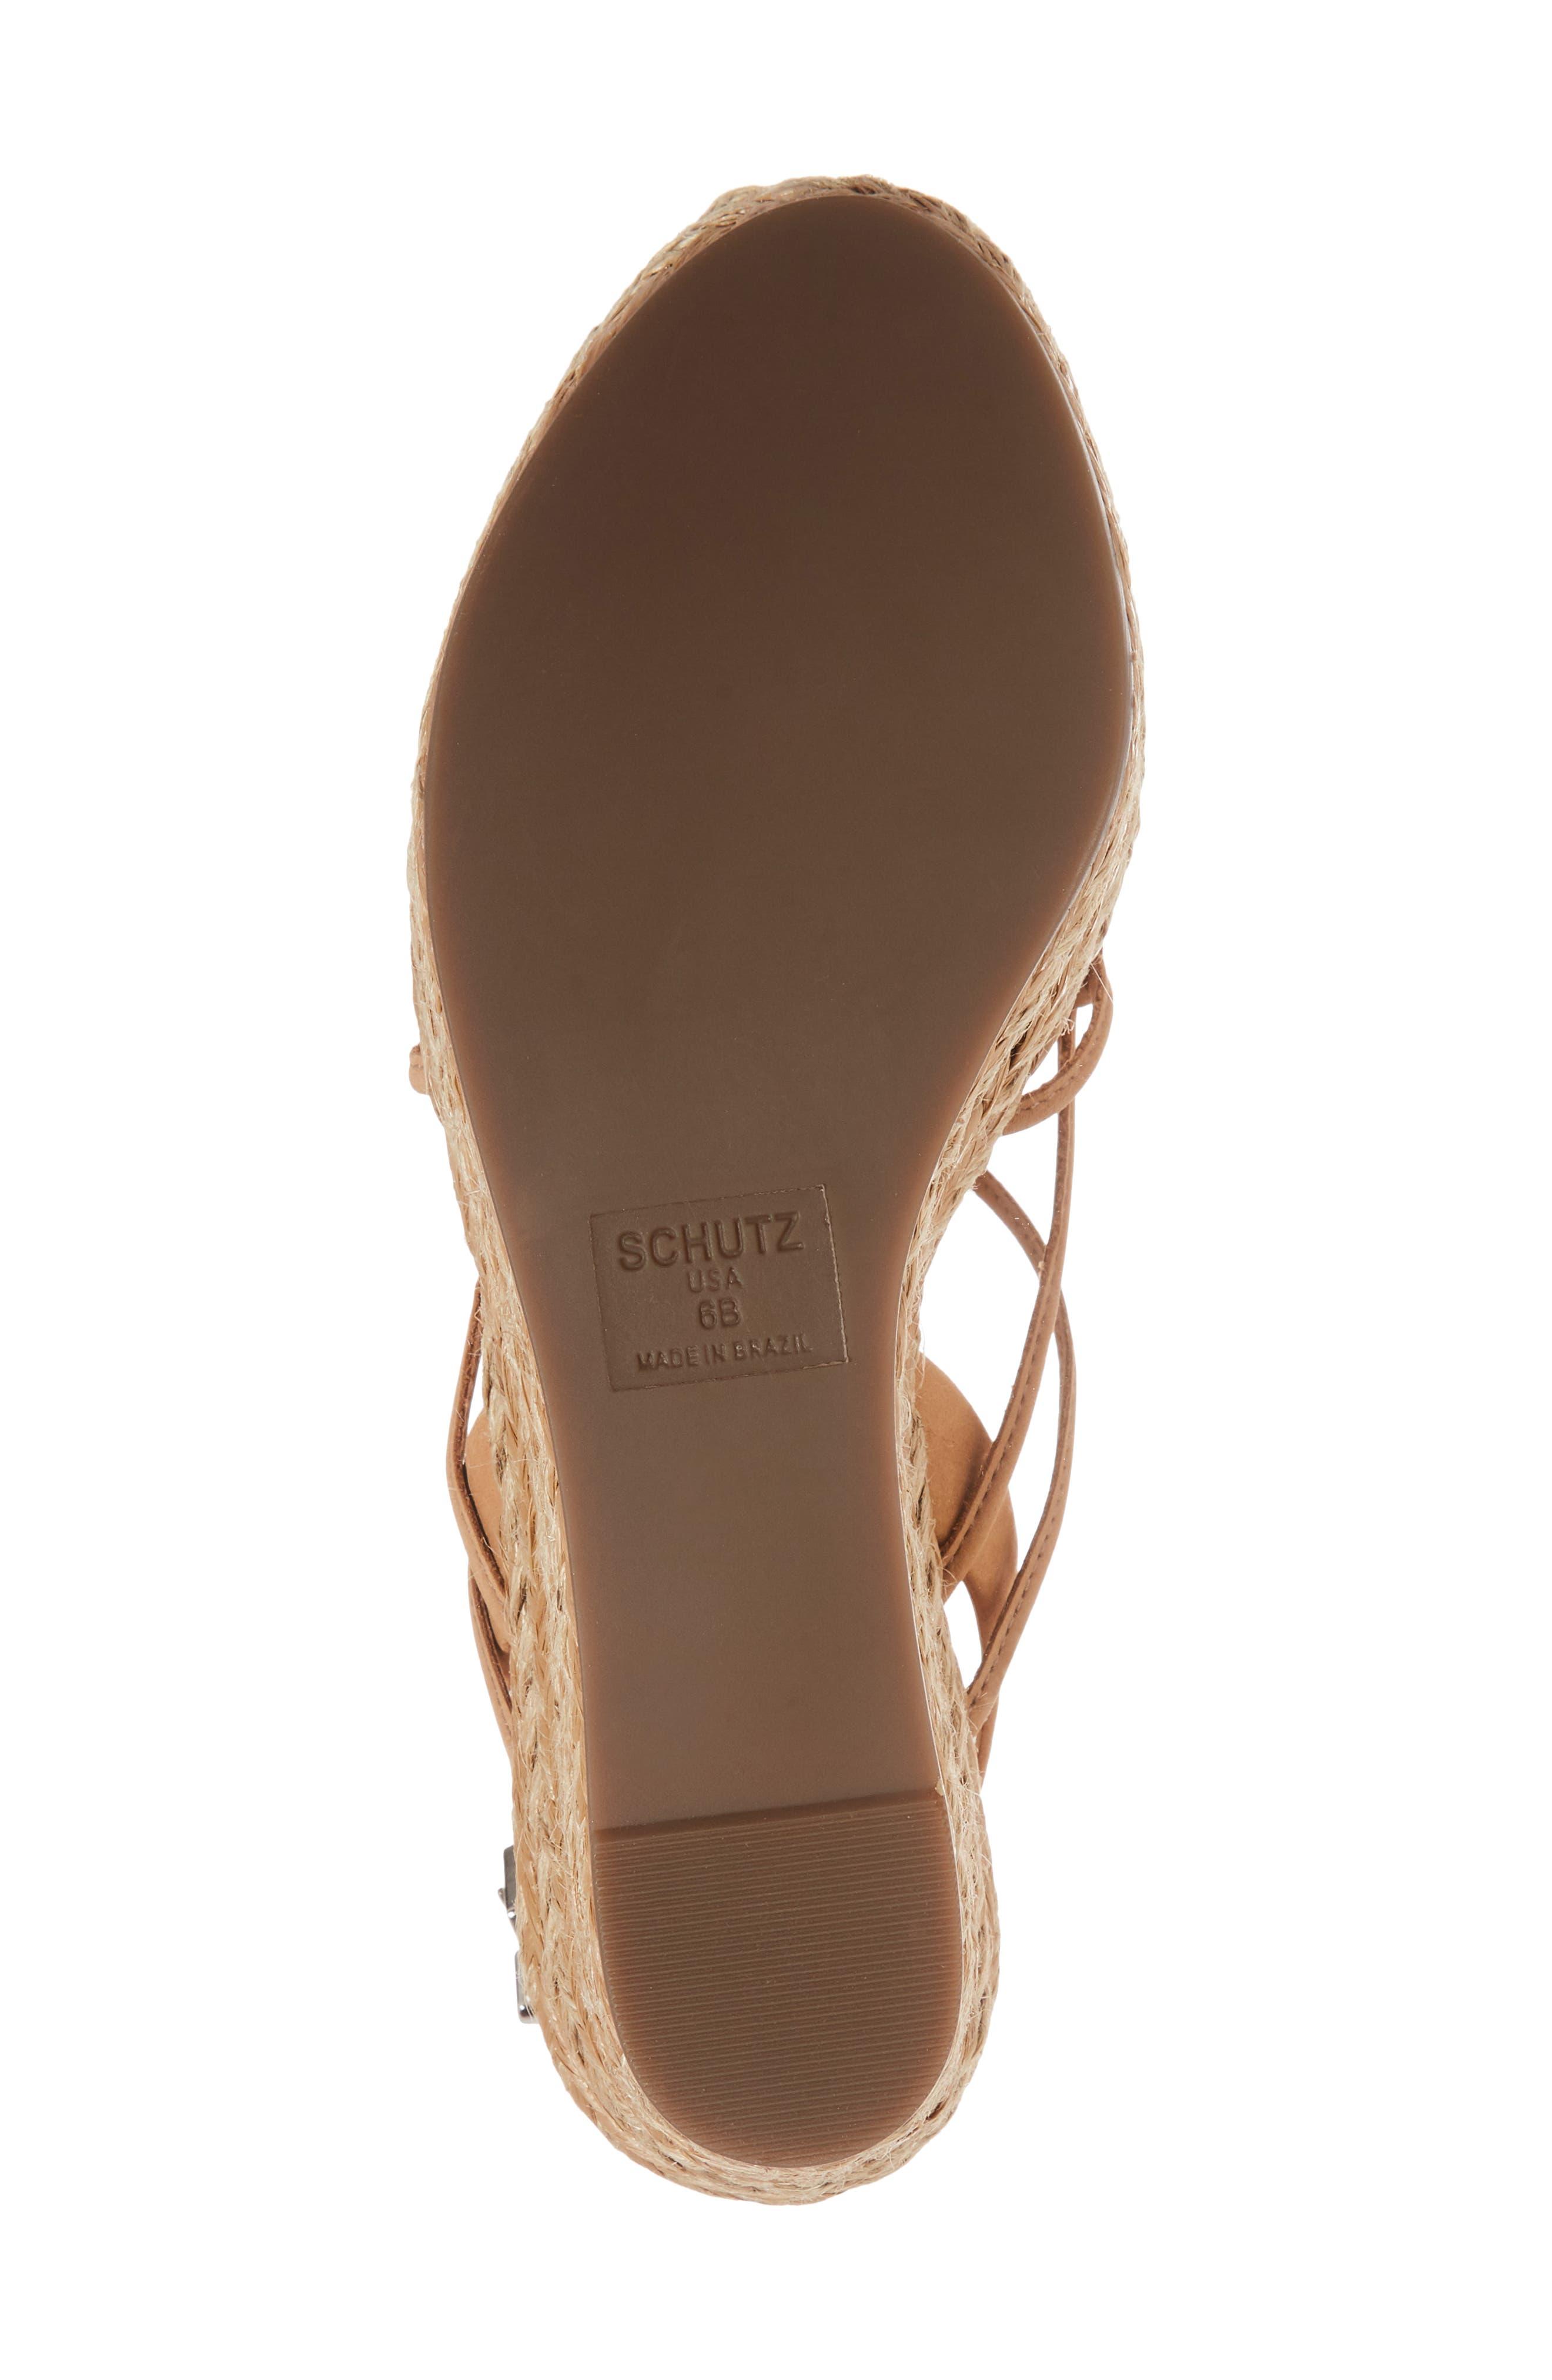 Latussa Platform Espadrille Sandal,                             Alternate thumbnail 6, color,                             Desert Leather